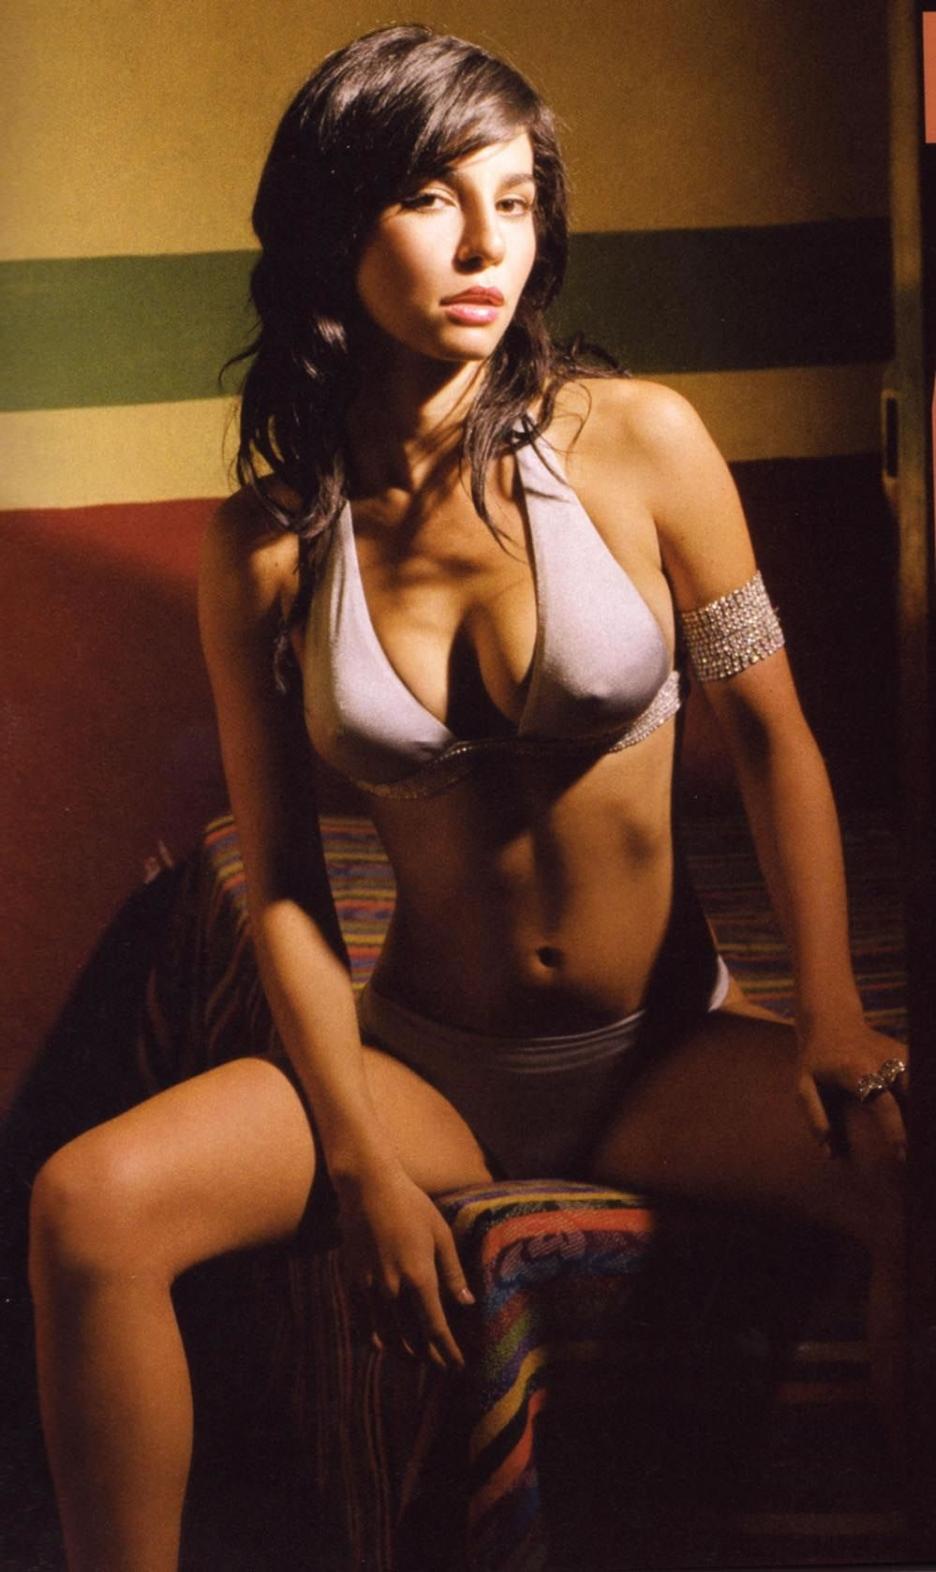 Martha Higareda porno